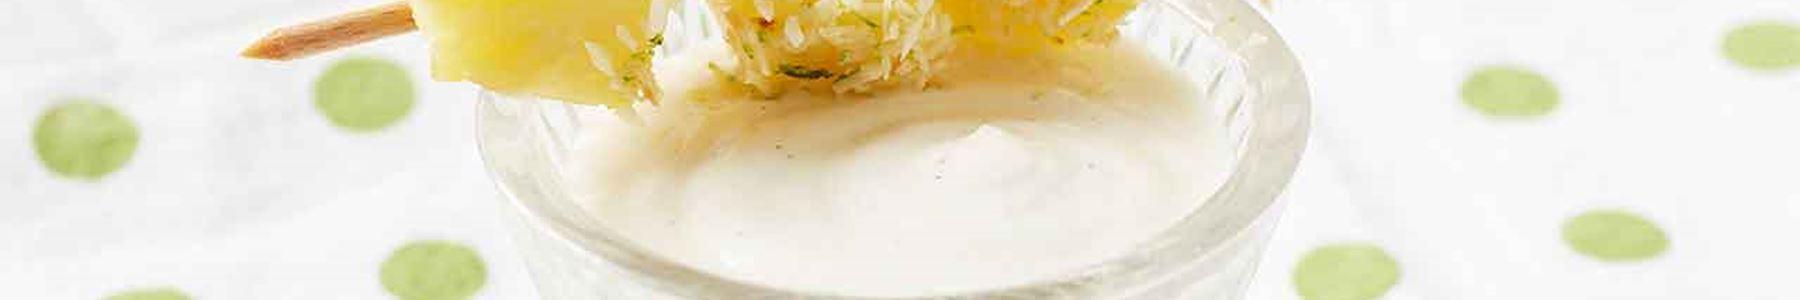 Enkel + Varm + Kalorisnål + Yoghurt